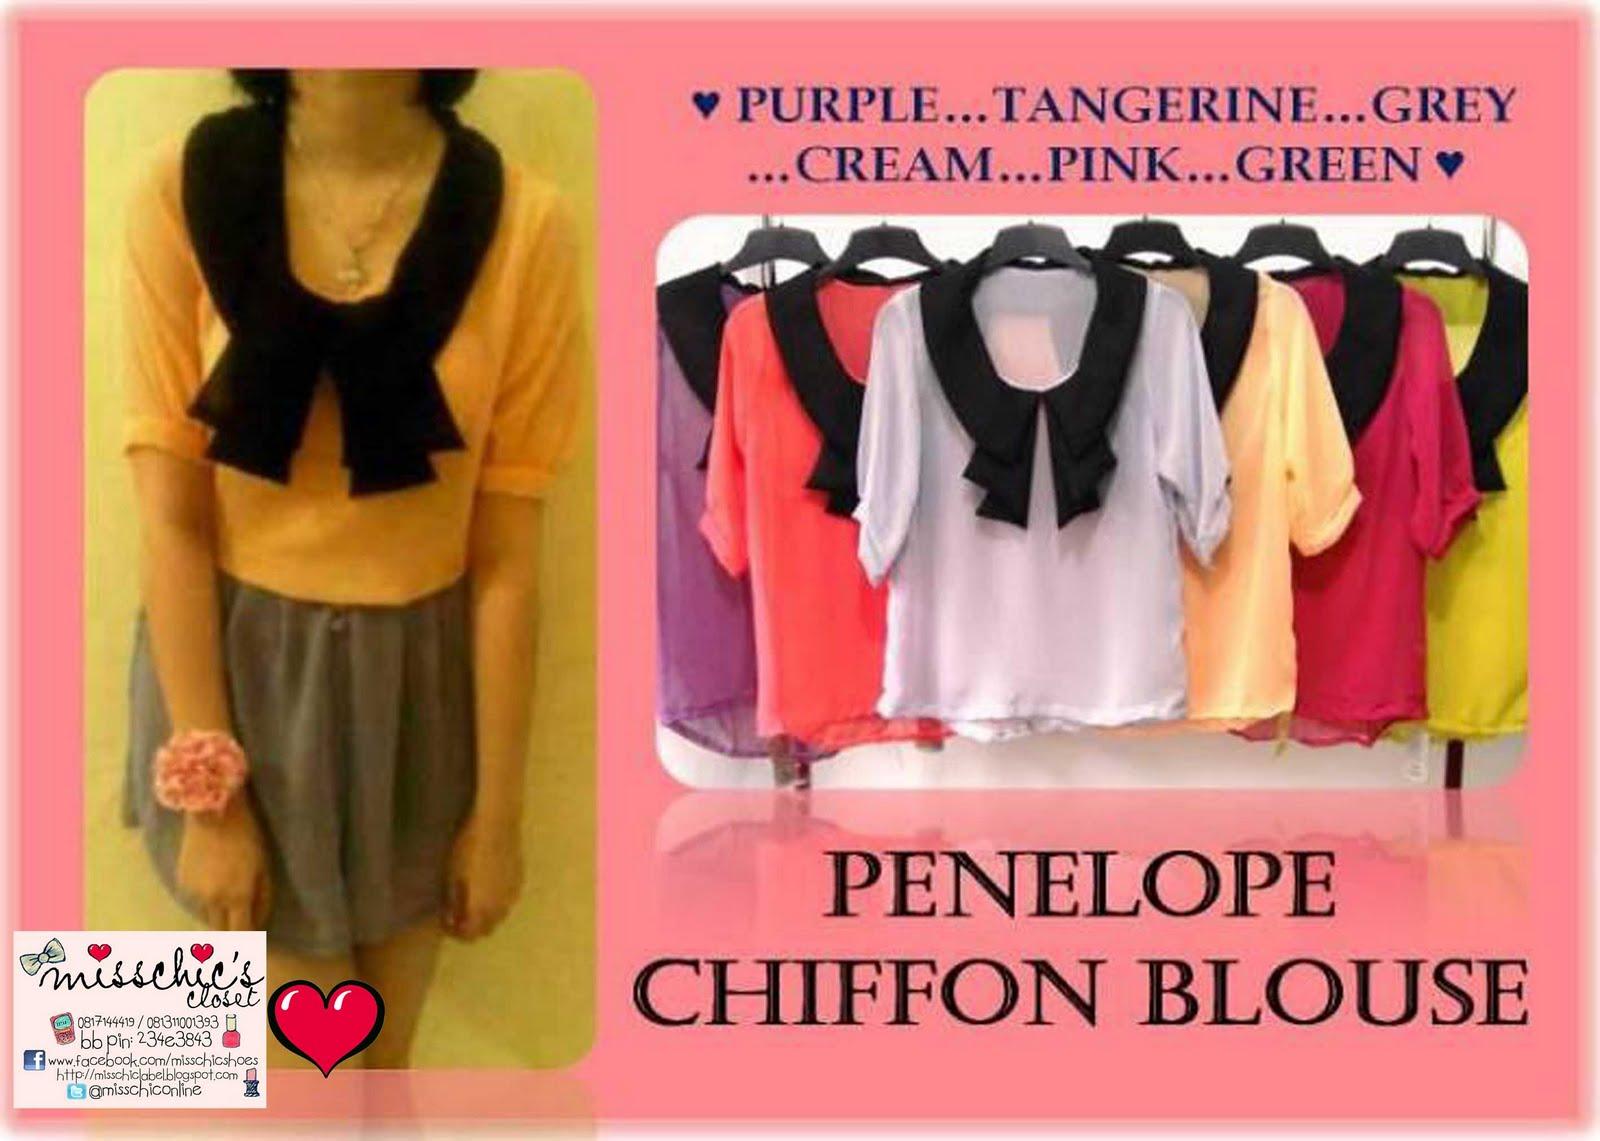 http://1.bp.blogspot.com/-P1_bMmTFxfE/Tbb_0RQc0PI/AAAAAAAAAEI/mYRrN7Byrf8/s1600/penelope+chiffon+blouse.jpg